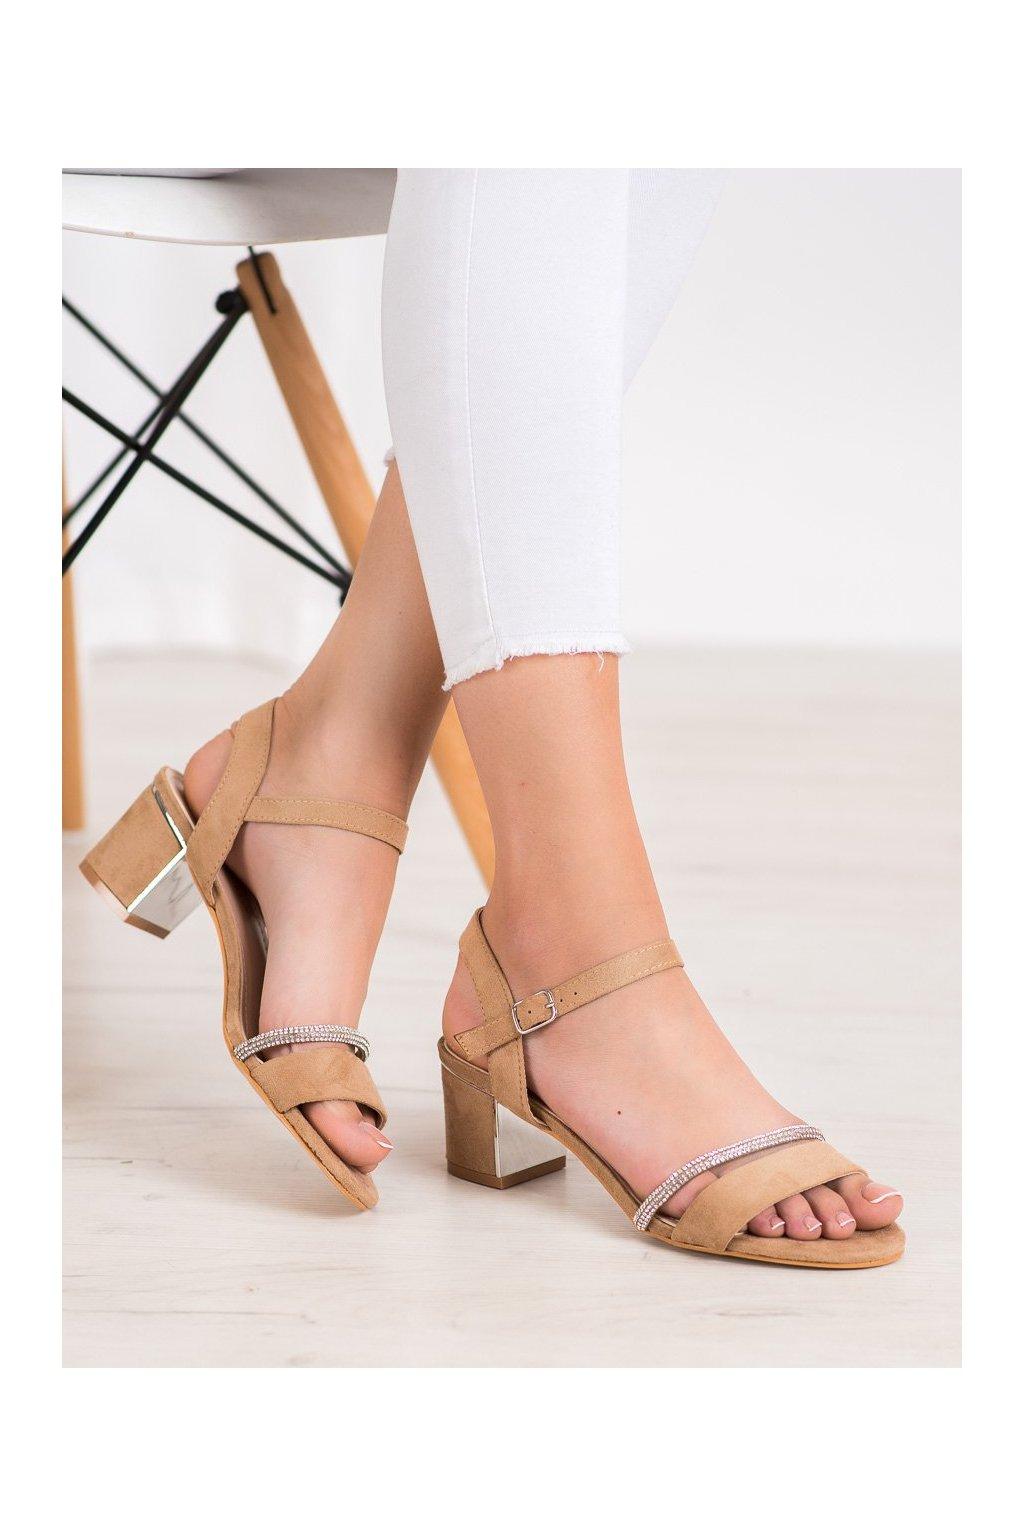 Hnedé sandále Anesia paris kod 88-390BE